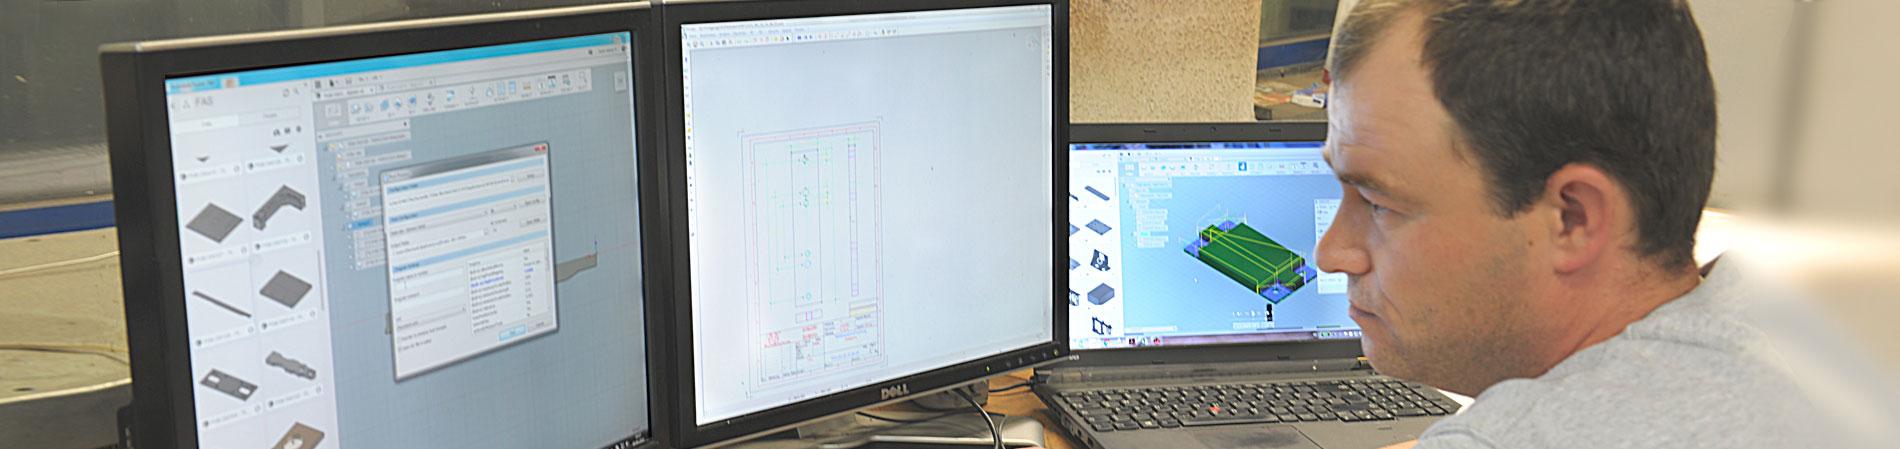 CAD/CAM Programmierung